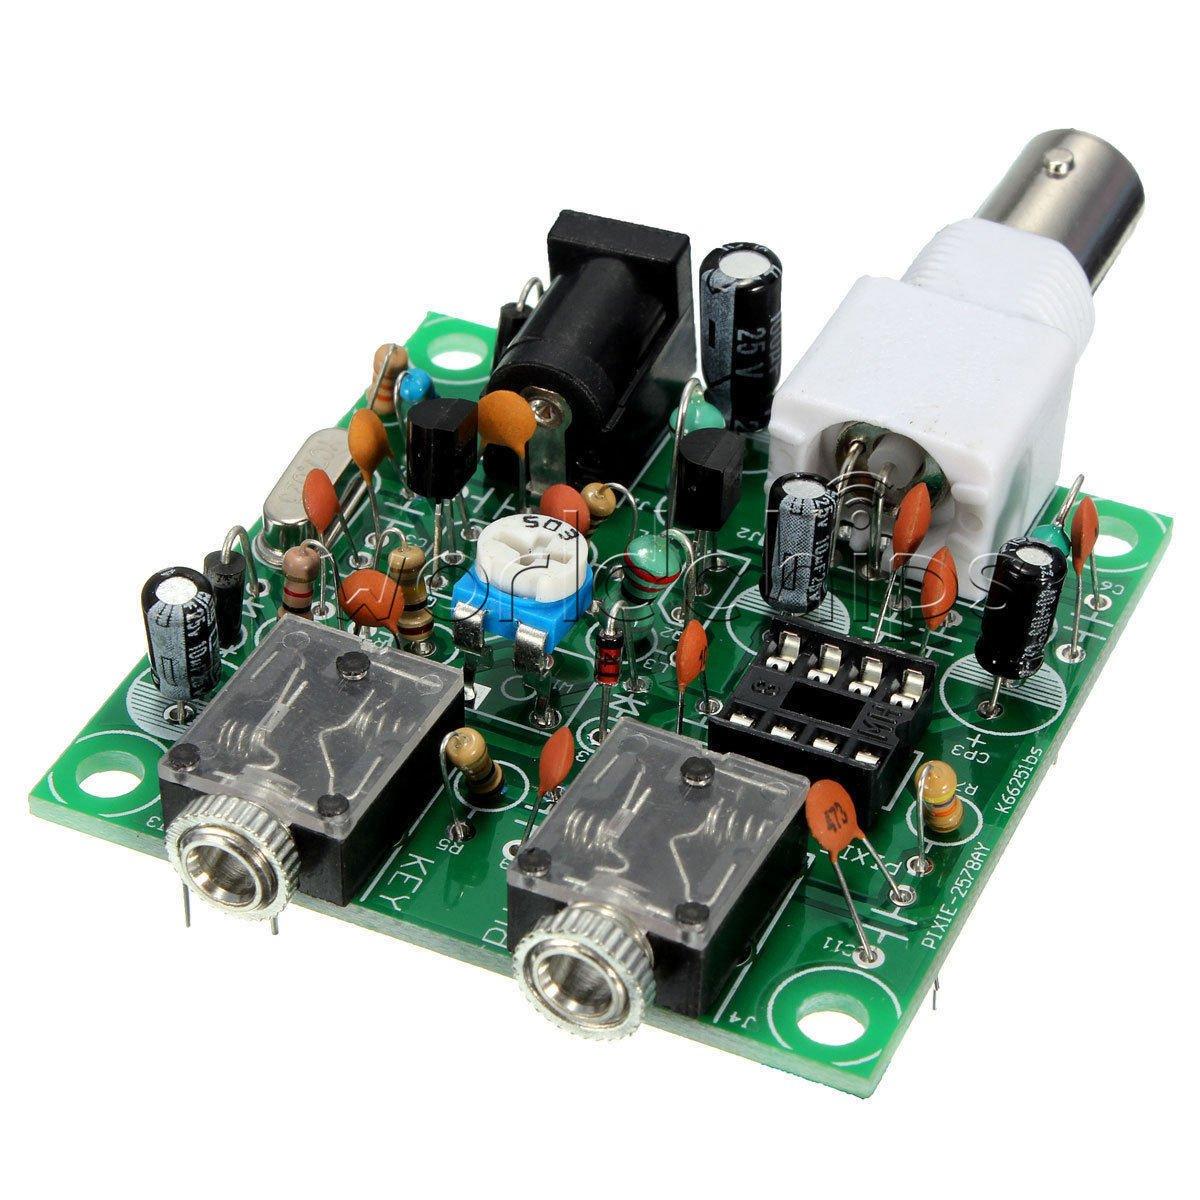 40M CW RADIO Shortwave Transmitter QRP Pixie Kit Receiver 7.023-7.026MHz